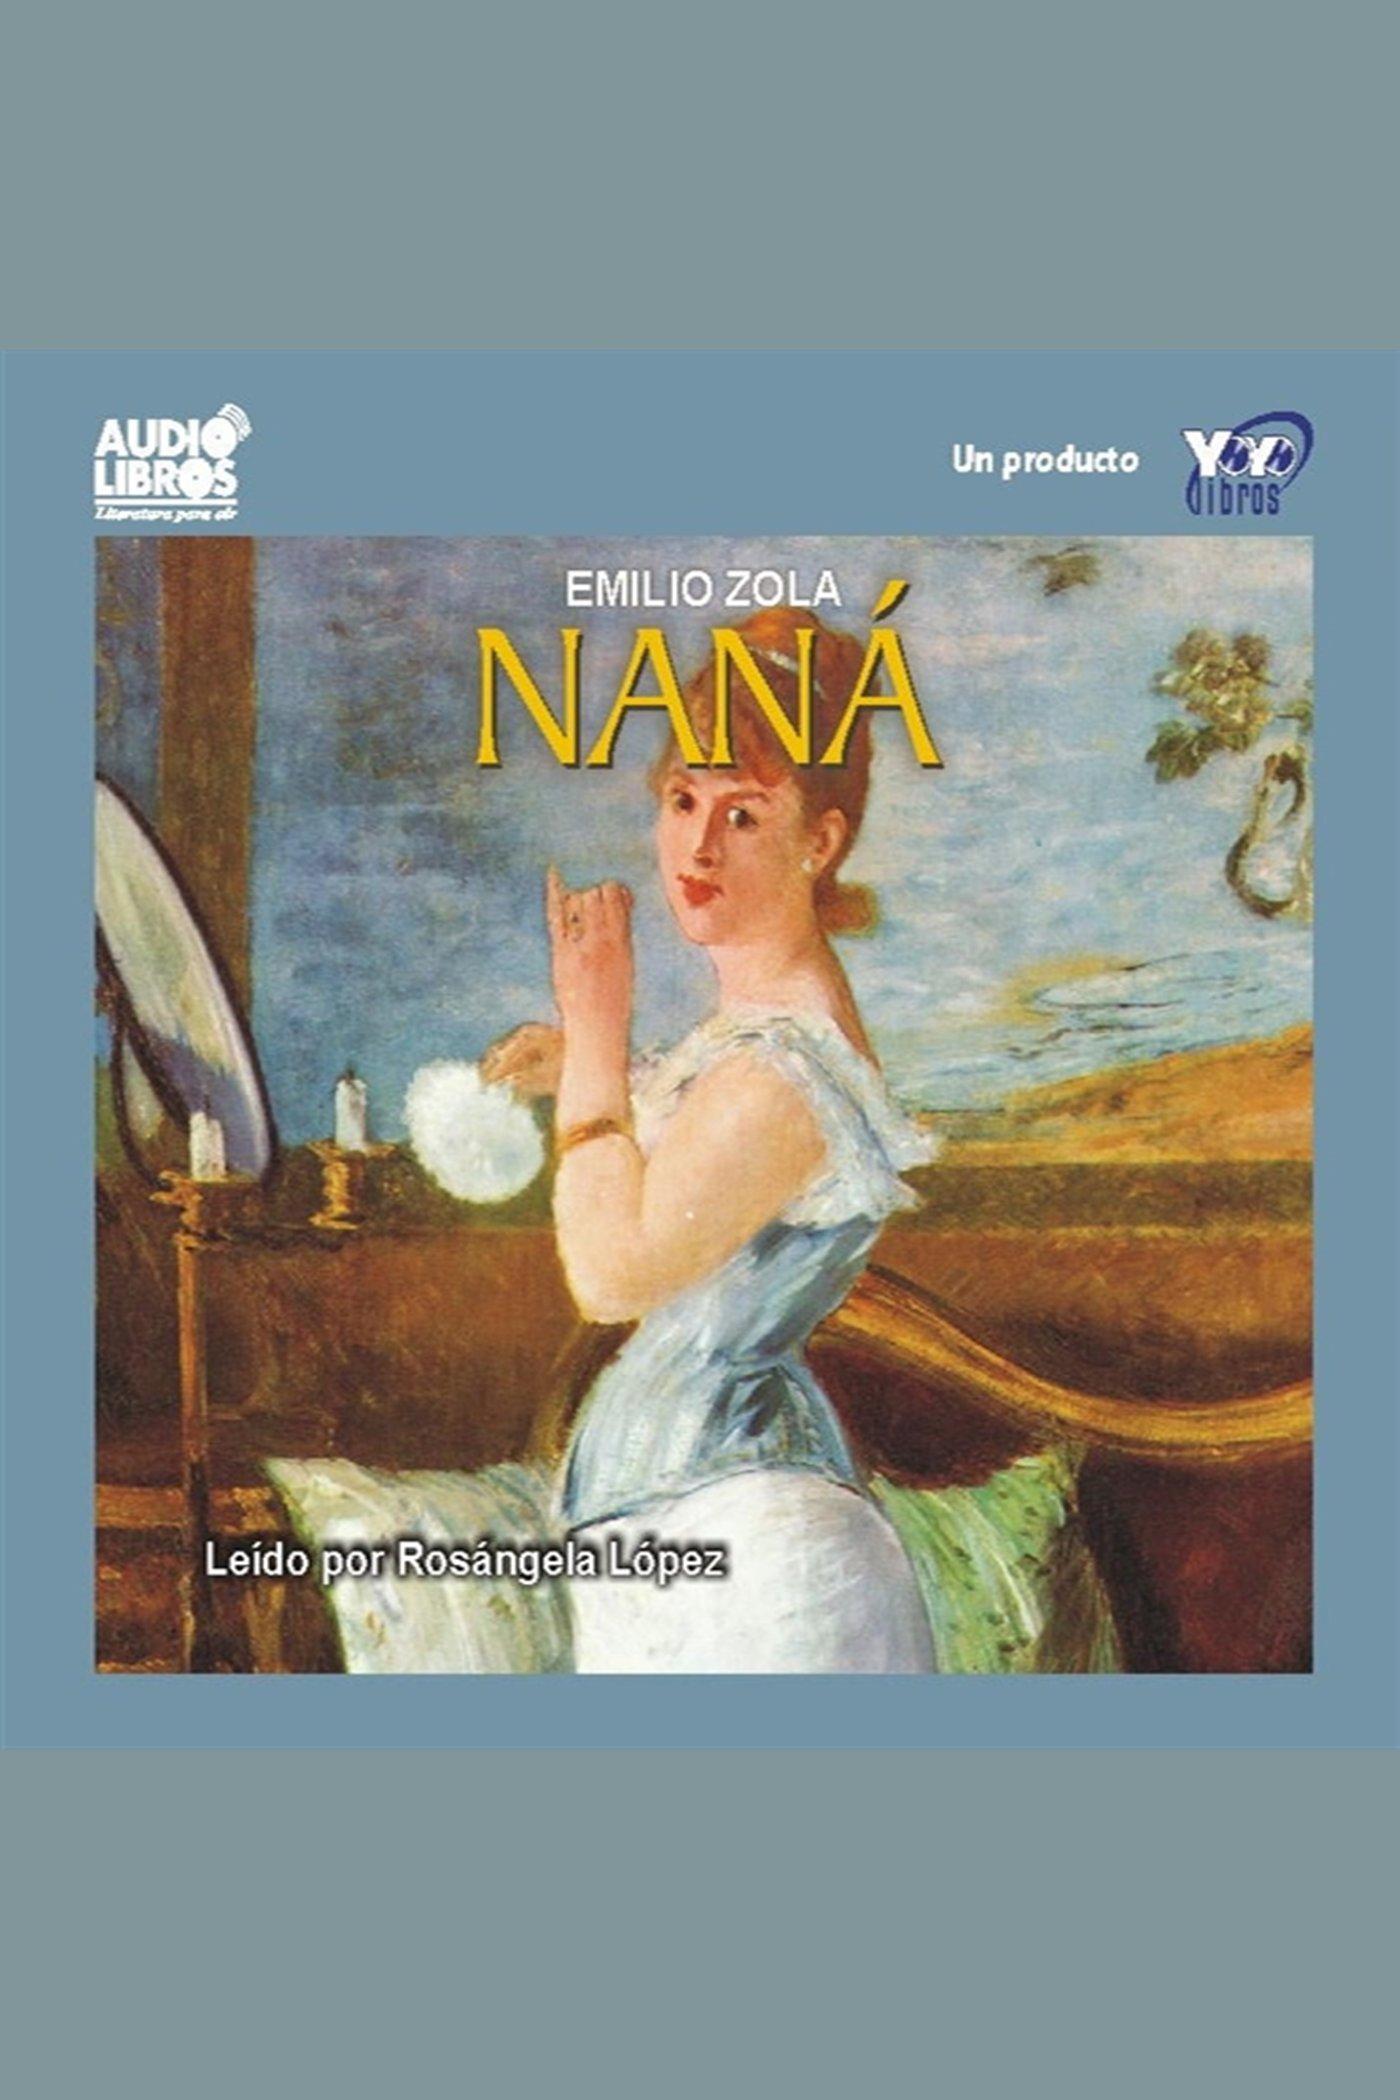 Esta es la portada del audiolibro Nana